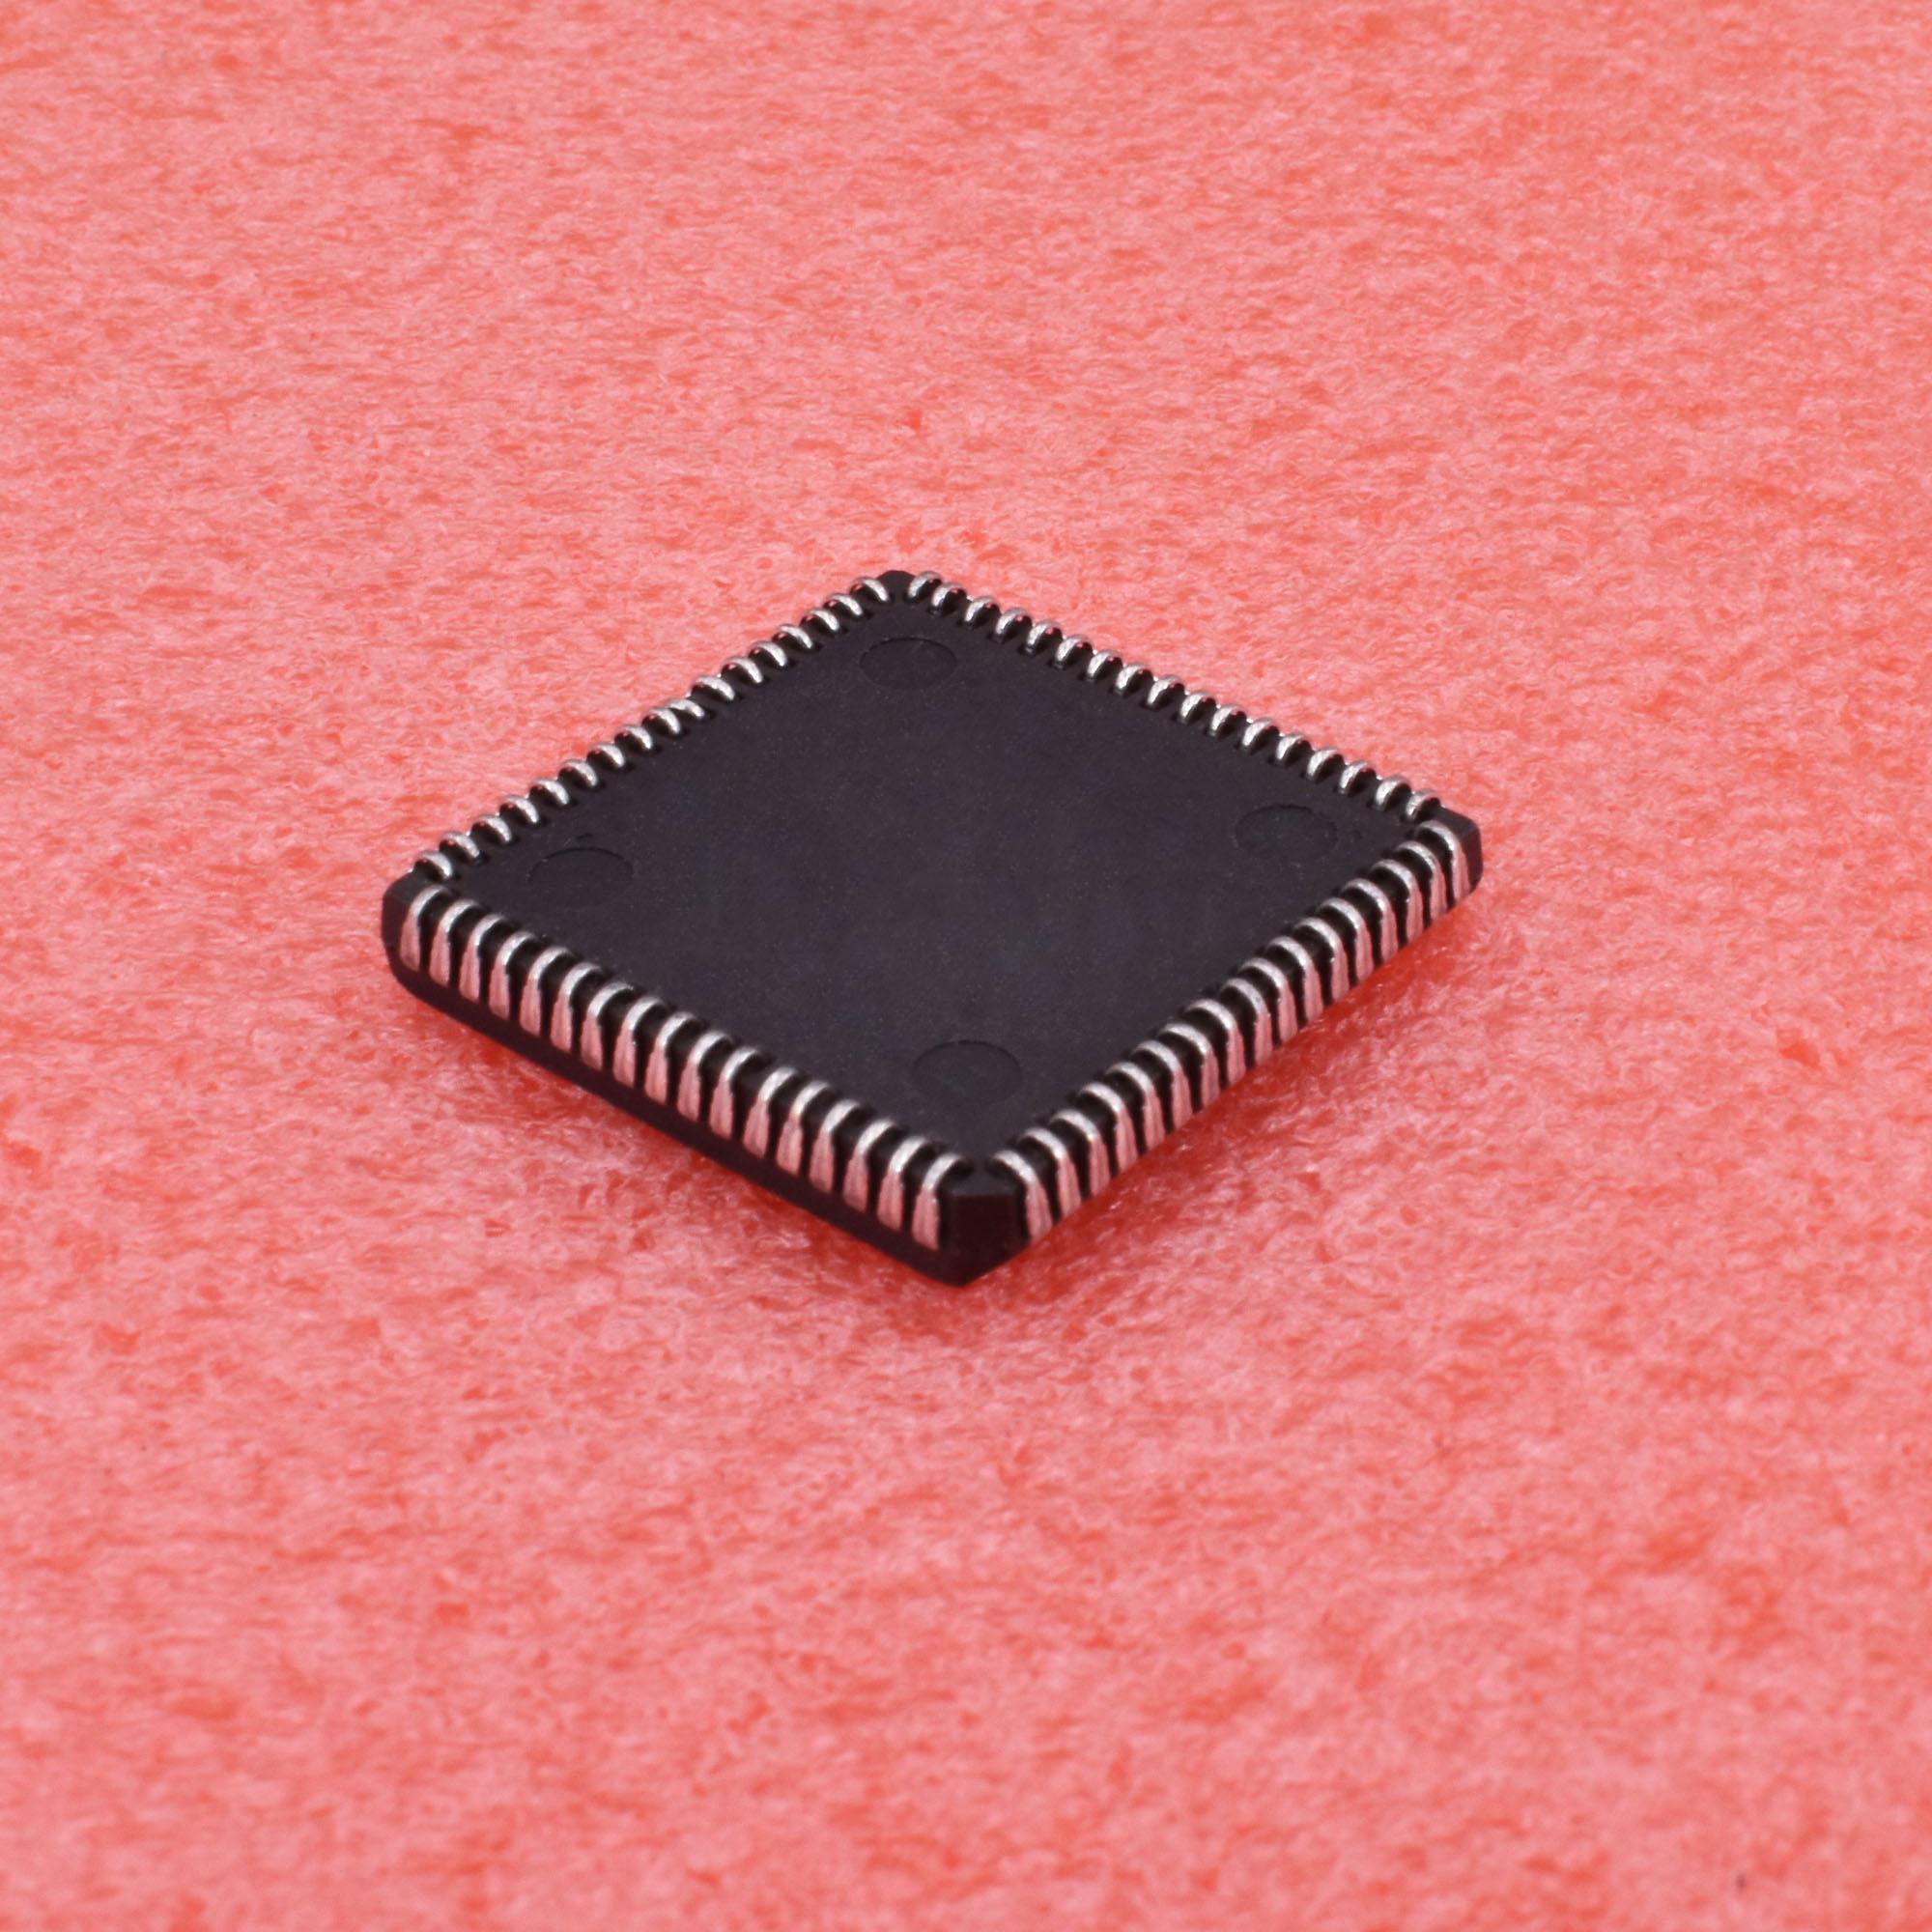 1PCS//5PCS MC68HC000FN16 PLCC 68PIN MC68HC000F MC68HC000FN Microcontroller